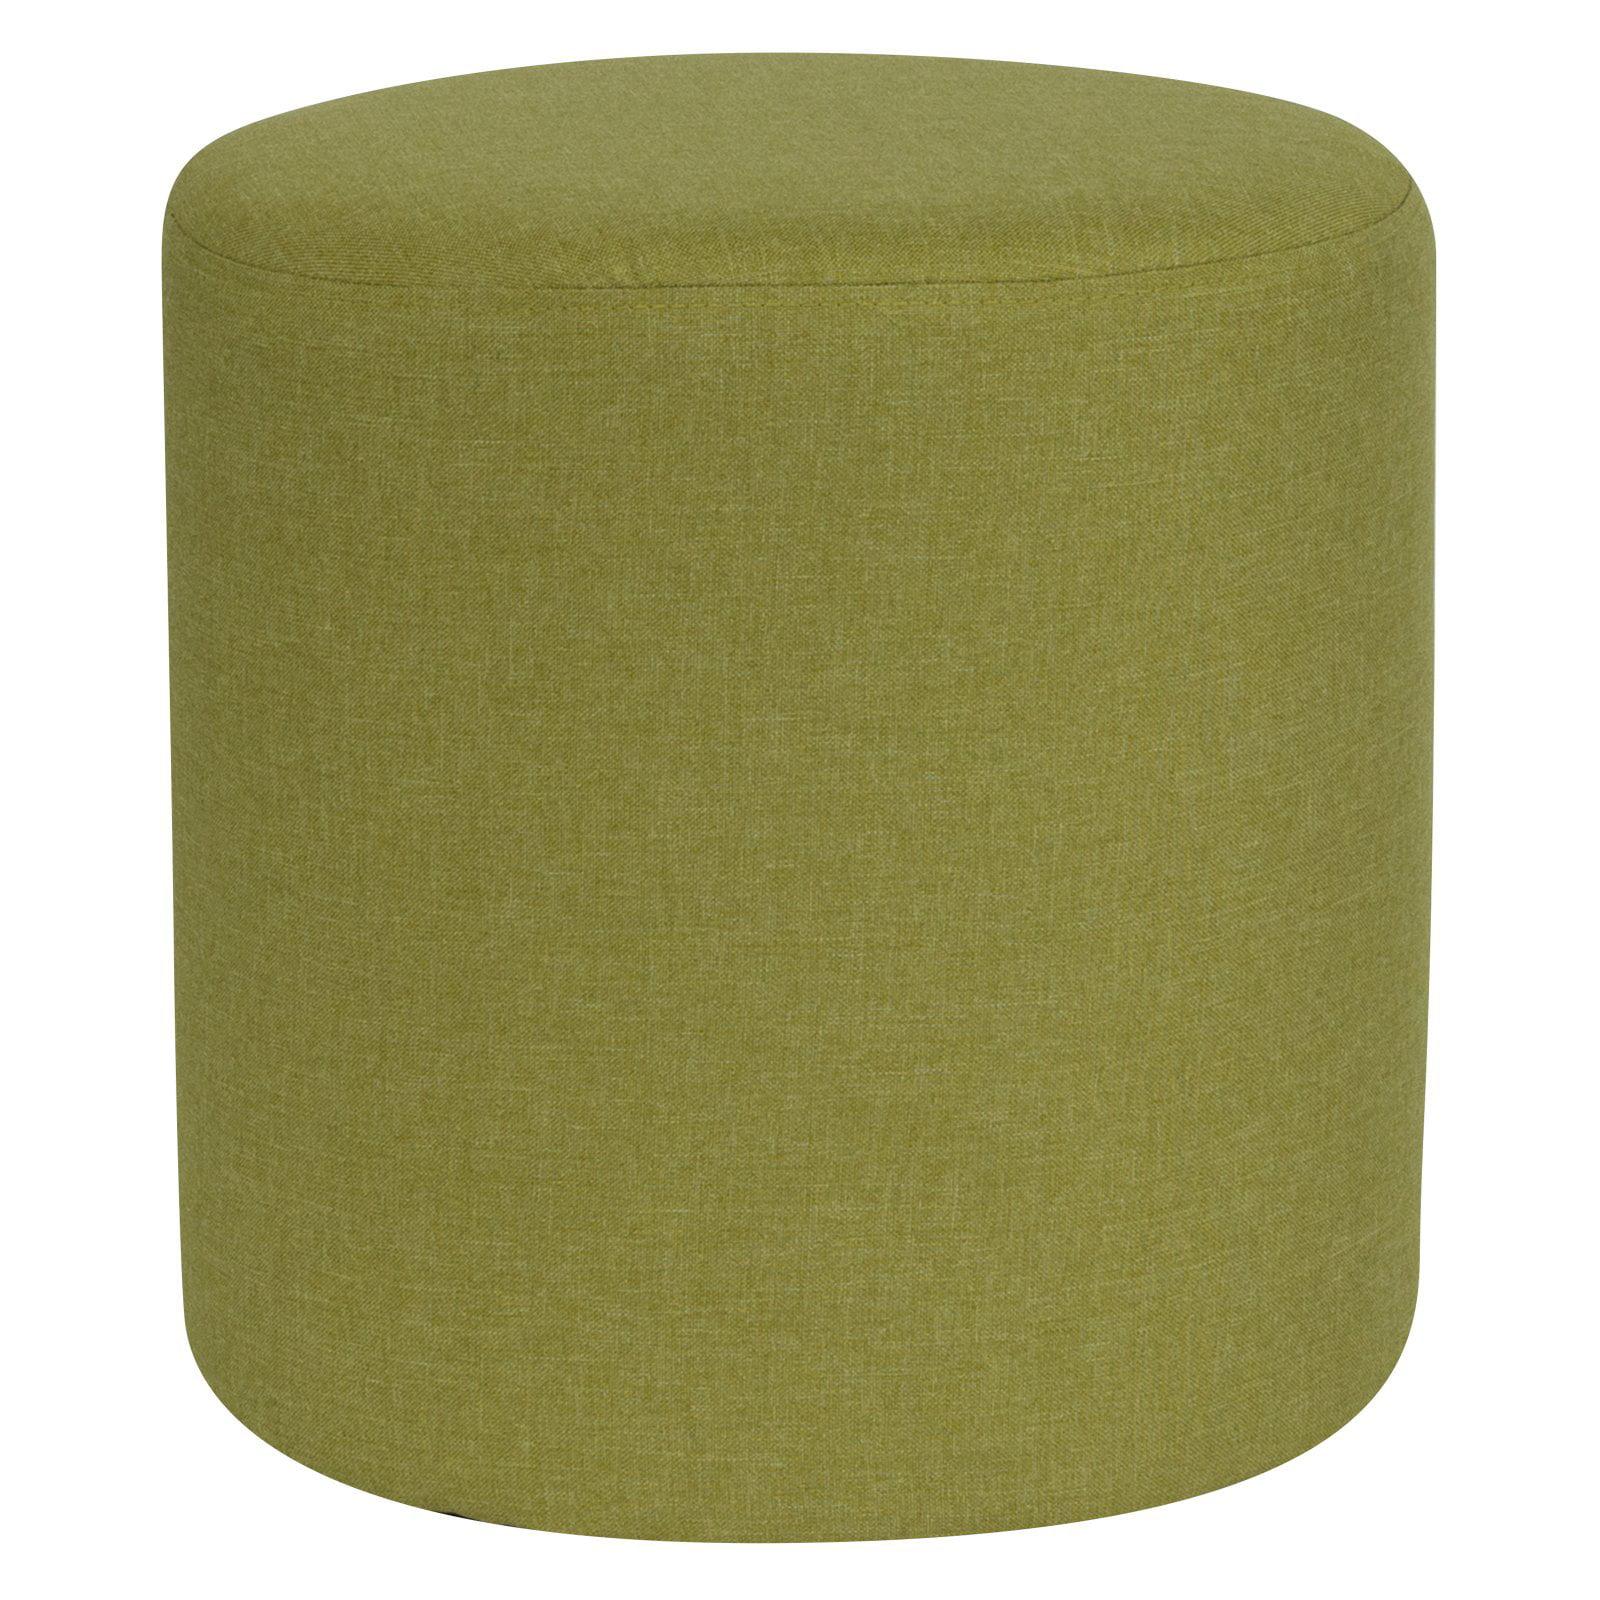 Flash Furniture Barrington Upholstered Round Ottoman Pouf in Purple Fabric